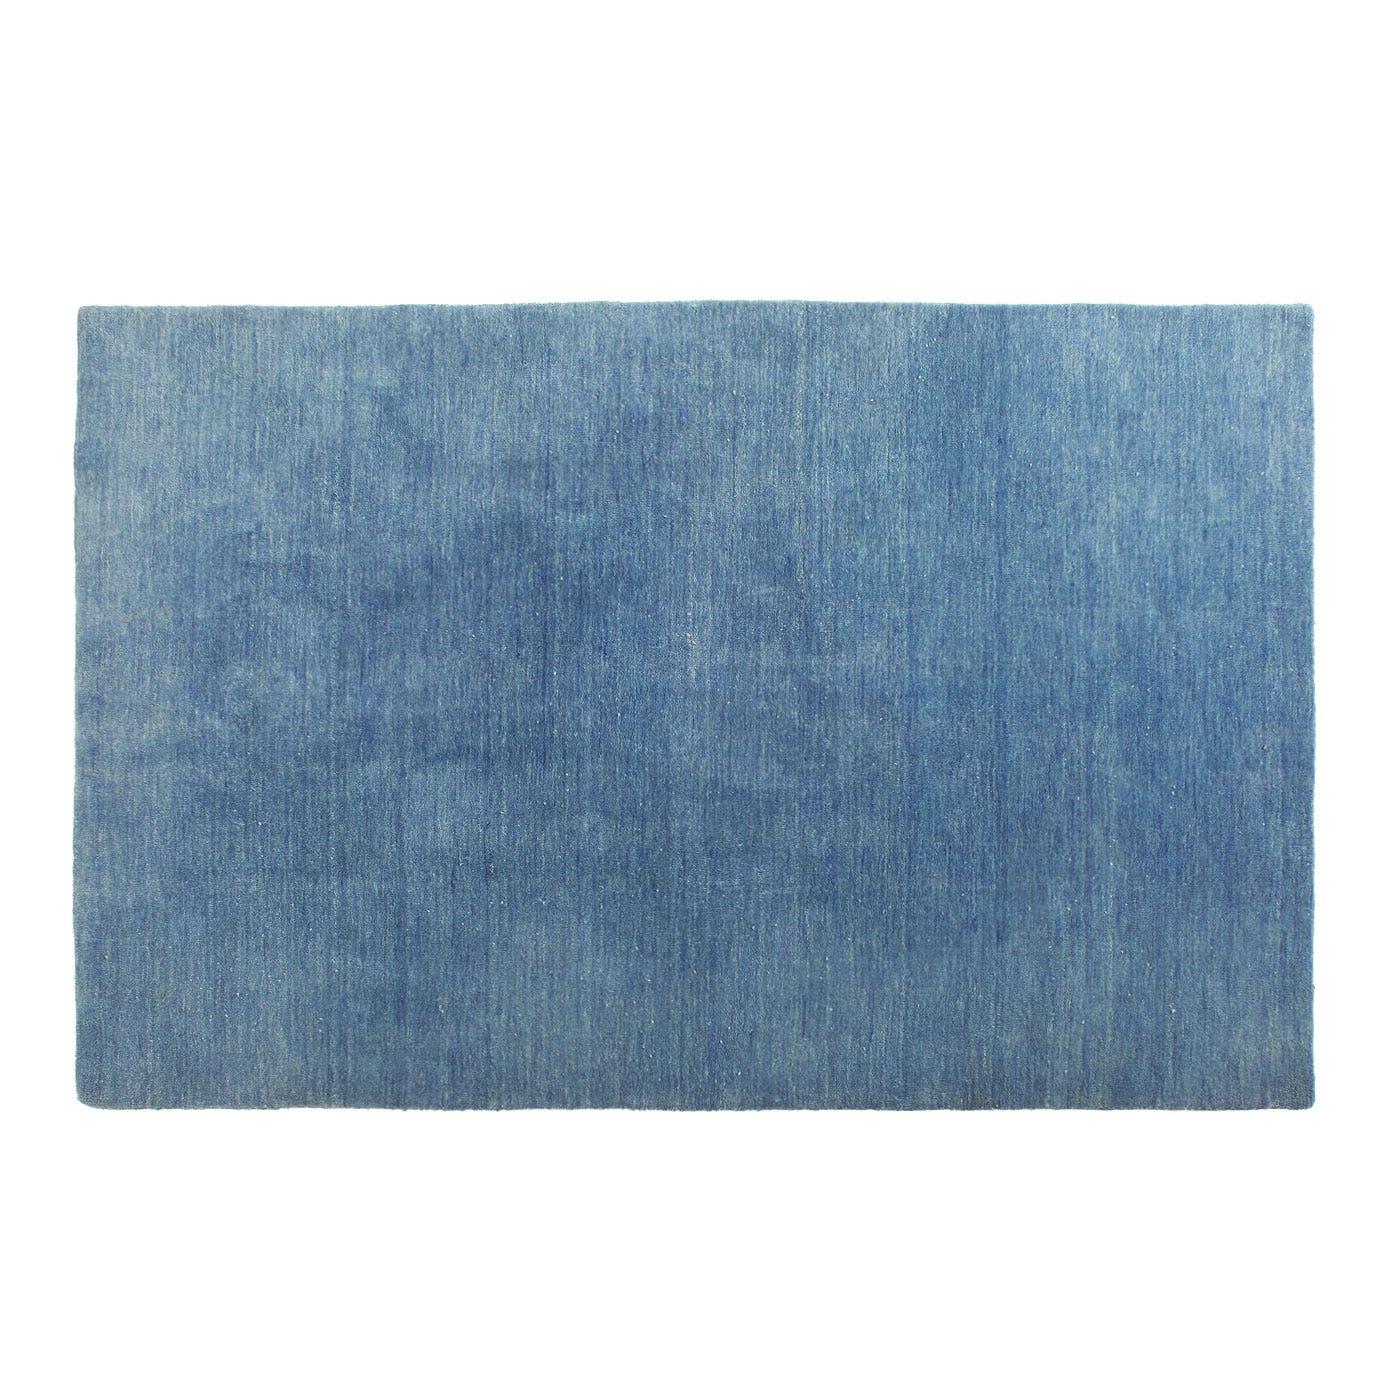 Exceptional Previous Image Hotel 3u0027 X 5u0027 Blue Wool ...